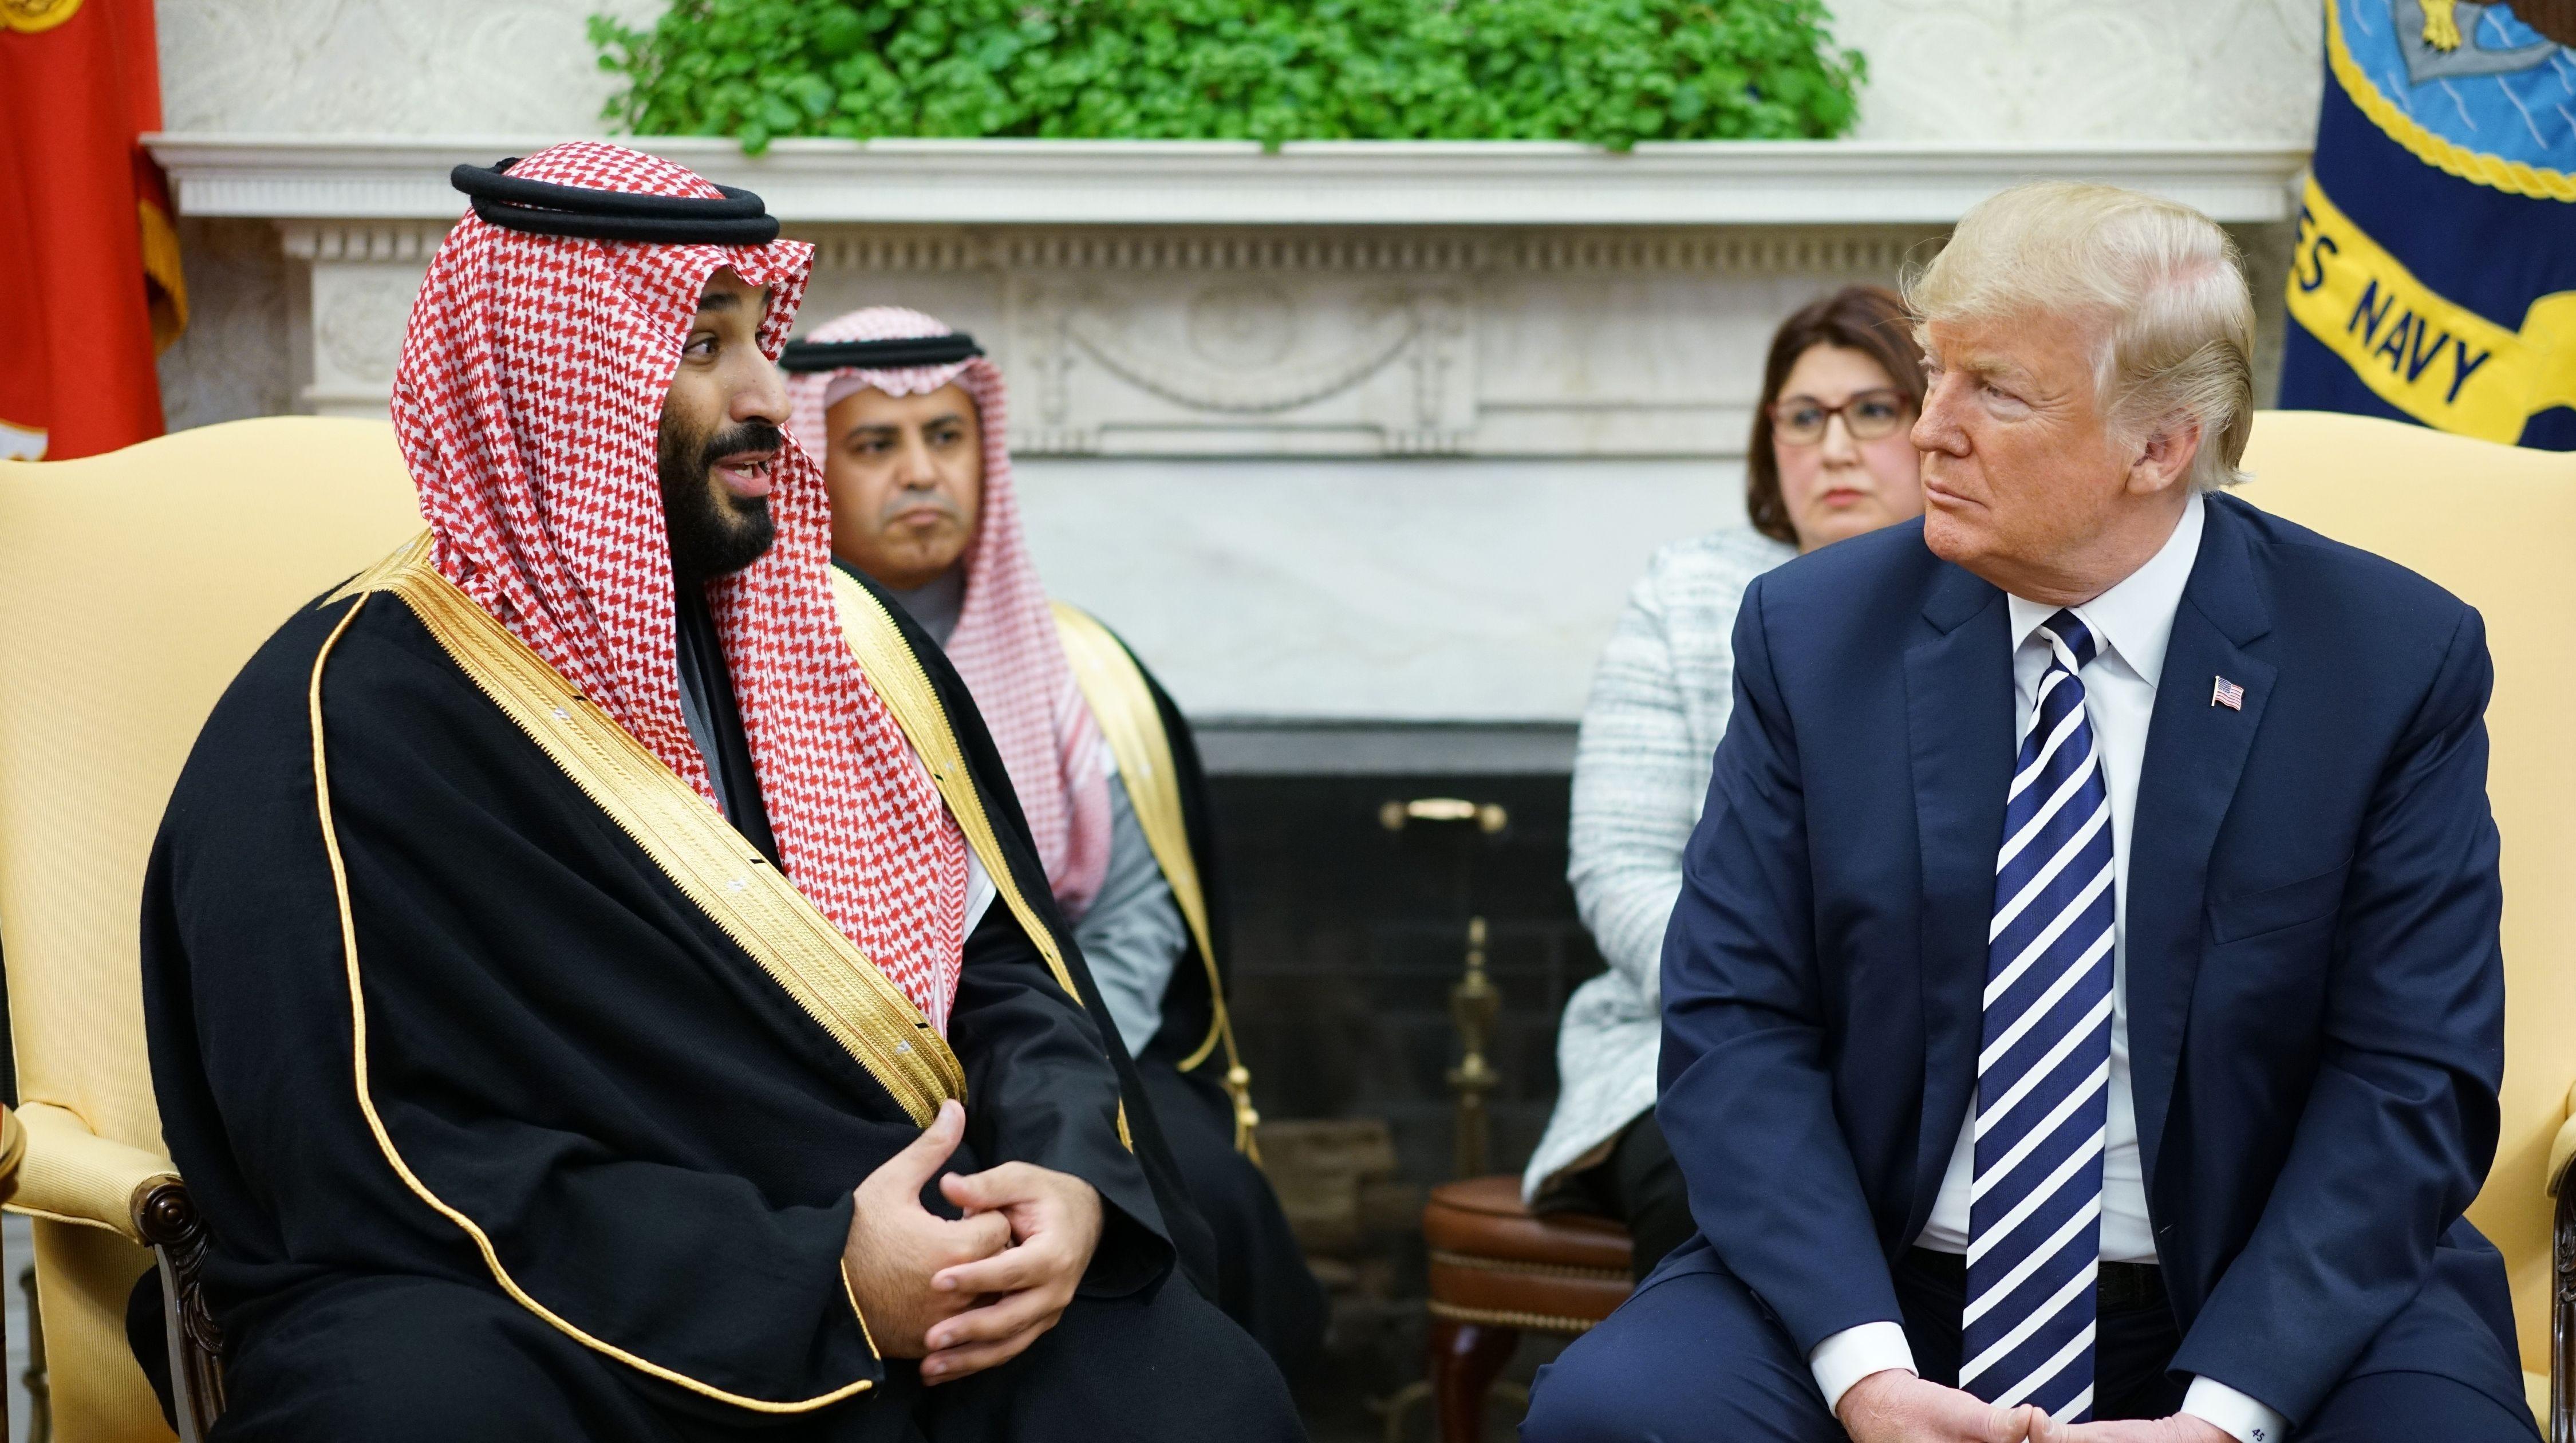 President Donald Trump and Saudi Crown Prince Mohammed bin Salman on March 20, 2018.